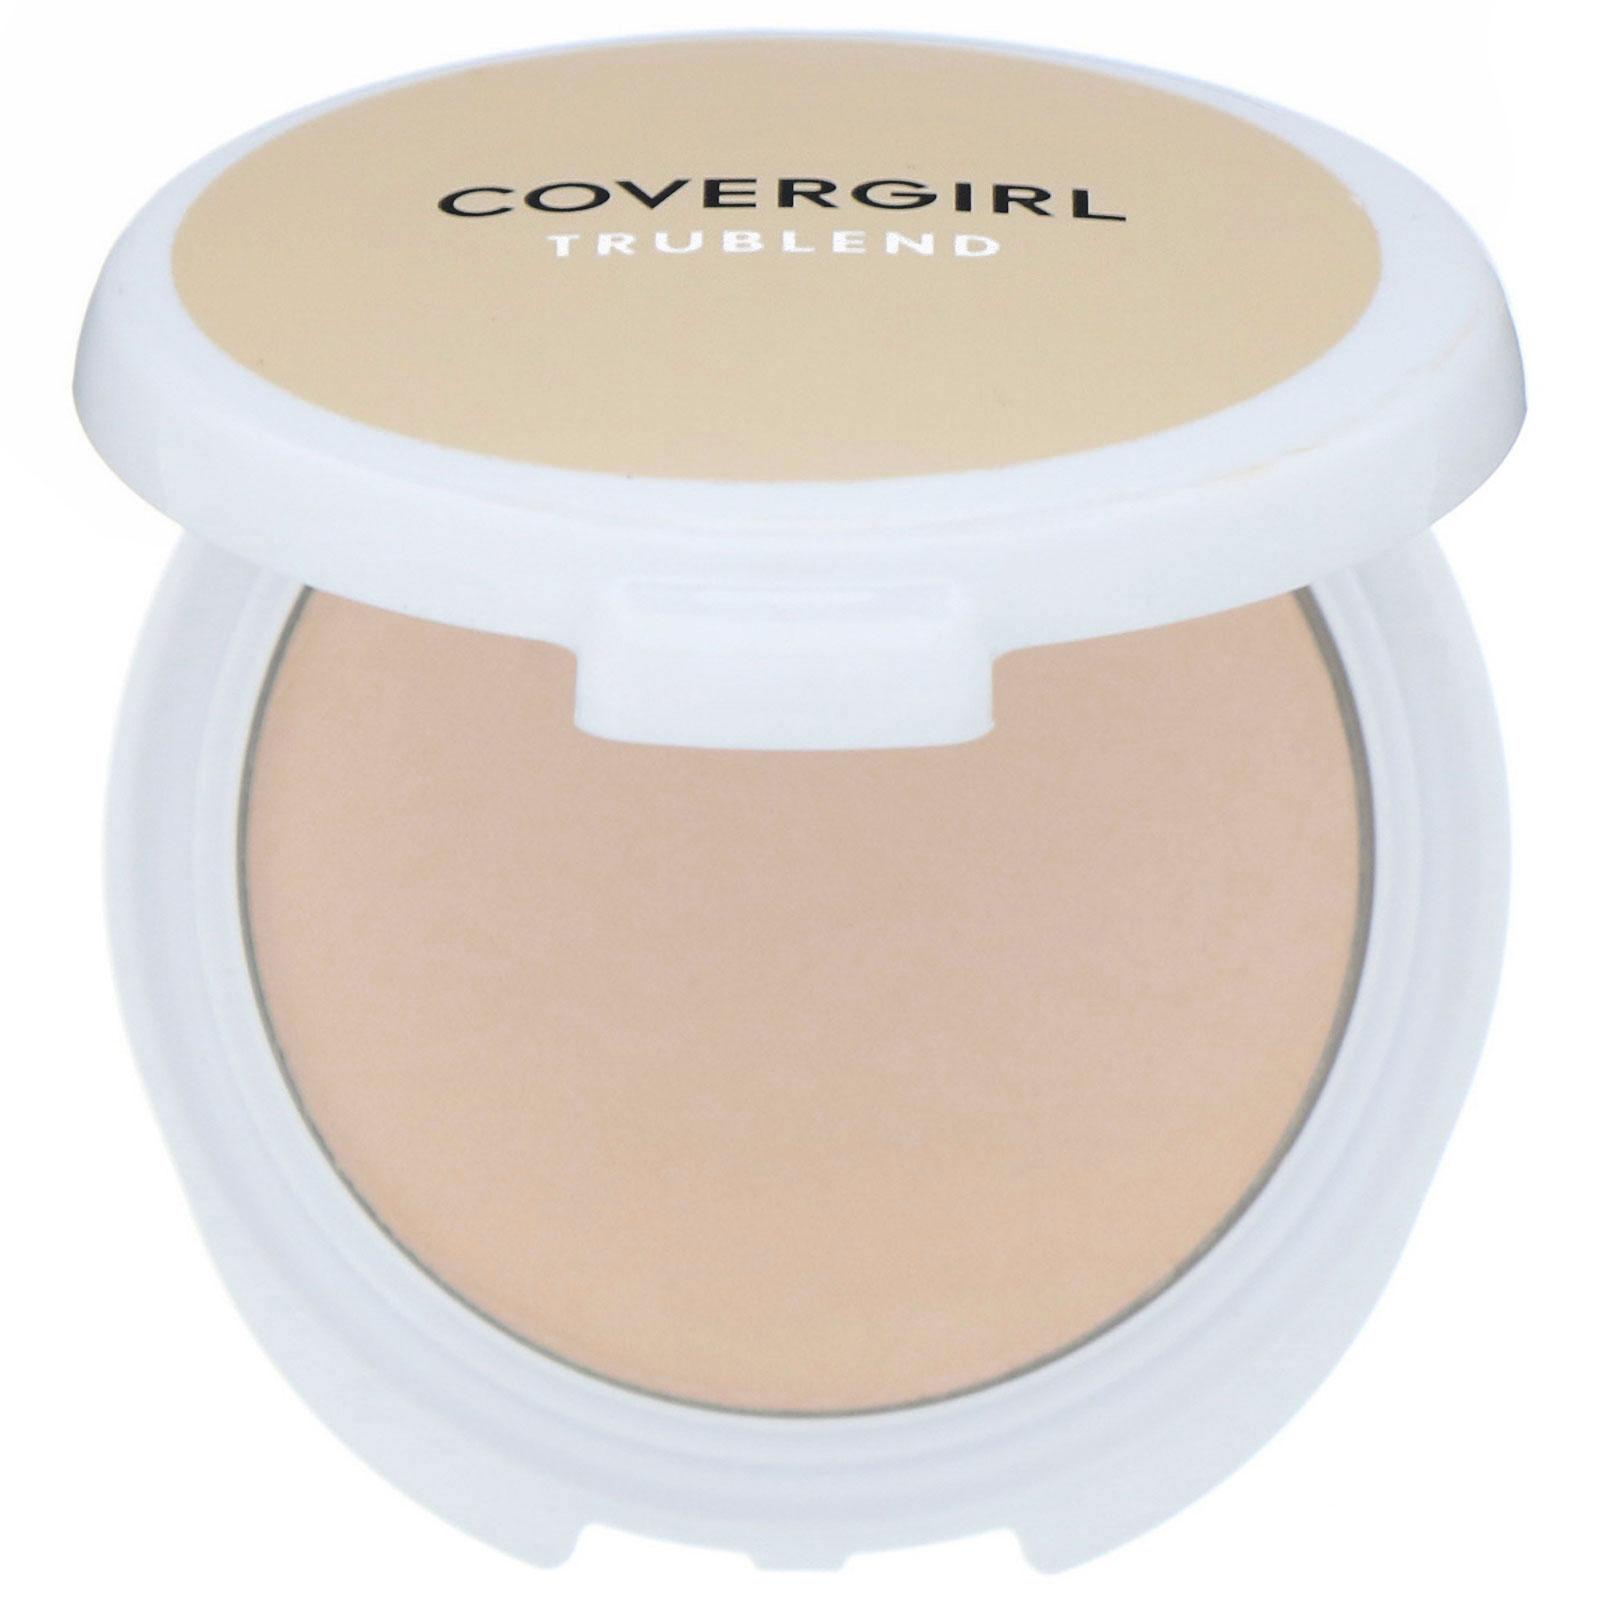 Covergirl Trublend Mineral Pressed